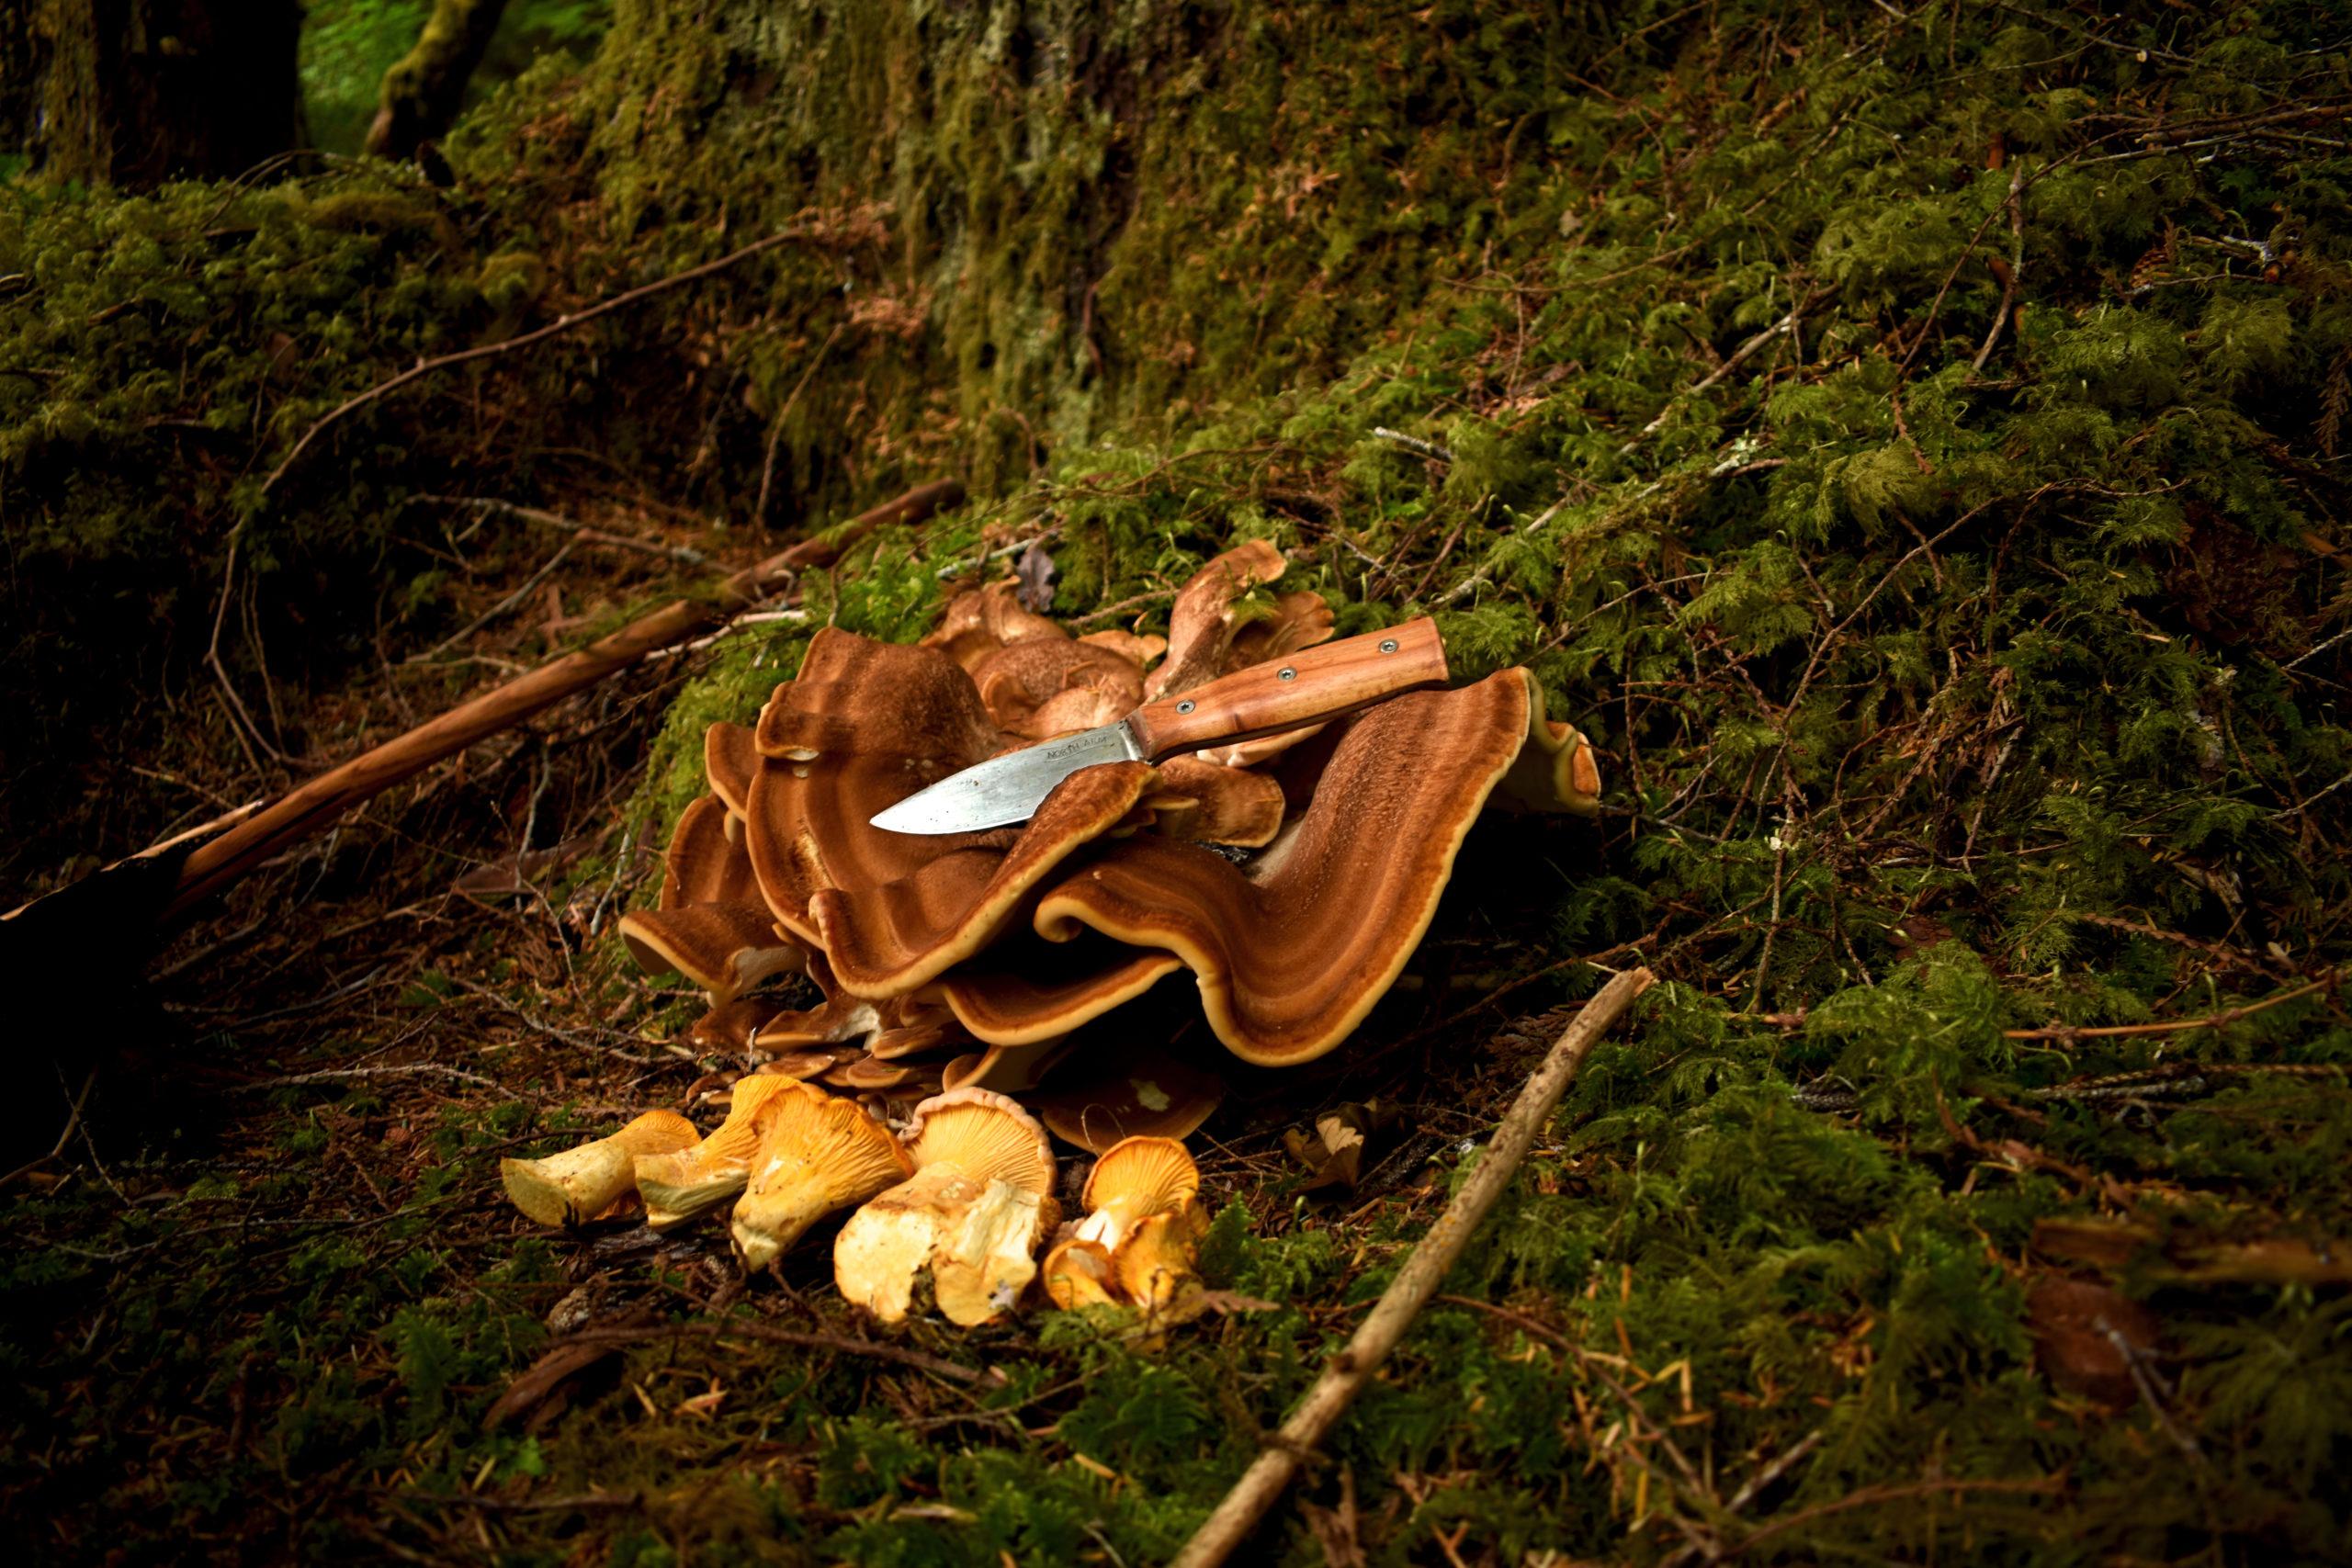 Mushroom_hunting_knife